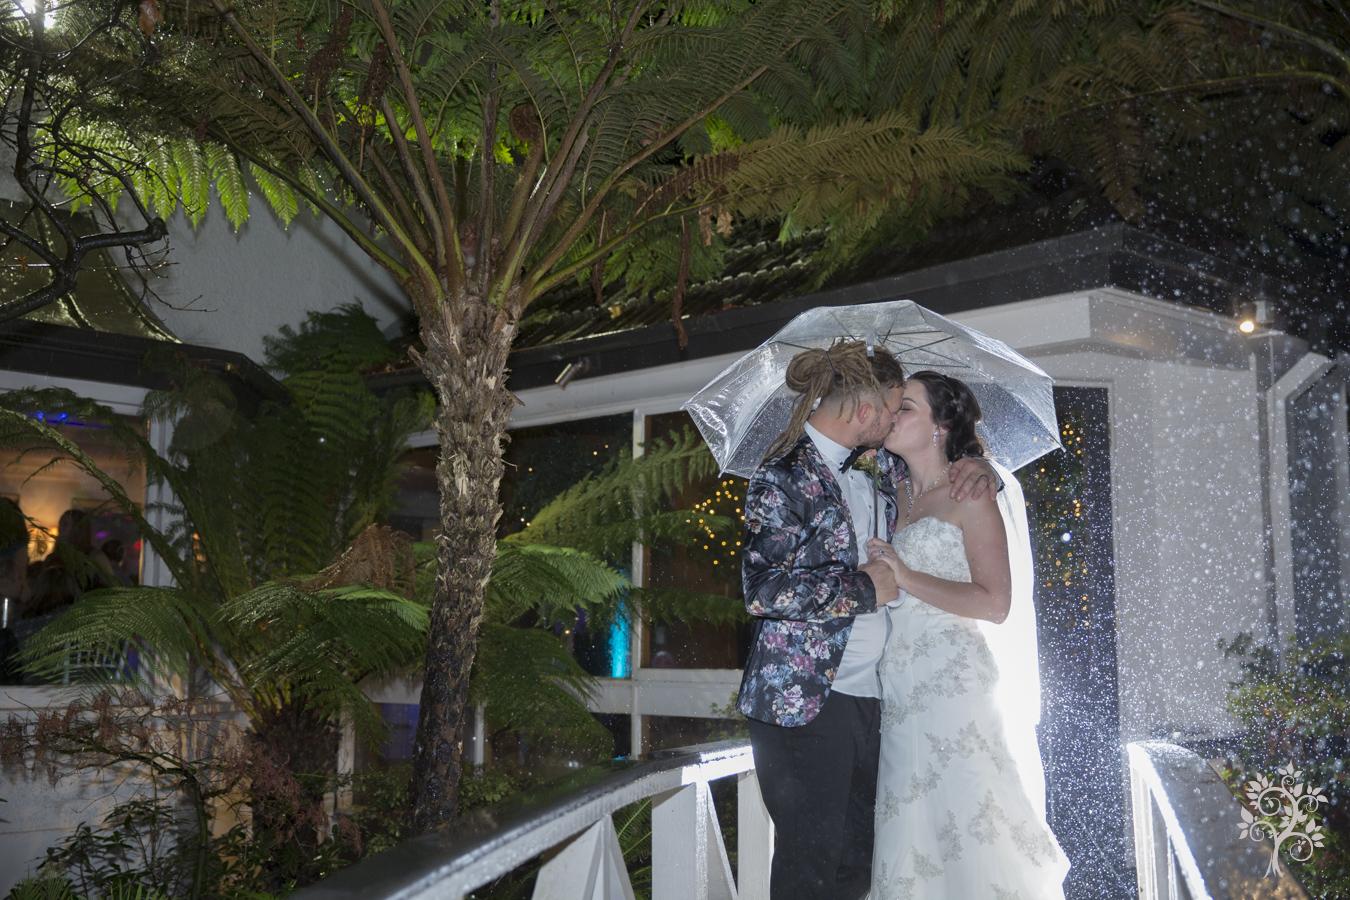 Melbourne Winter Wedding Photo 4